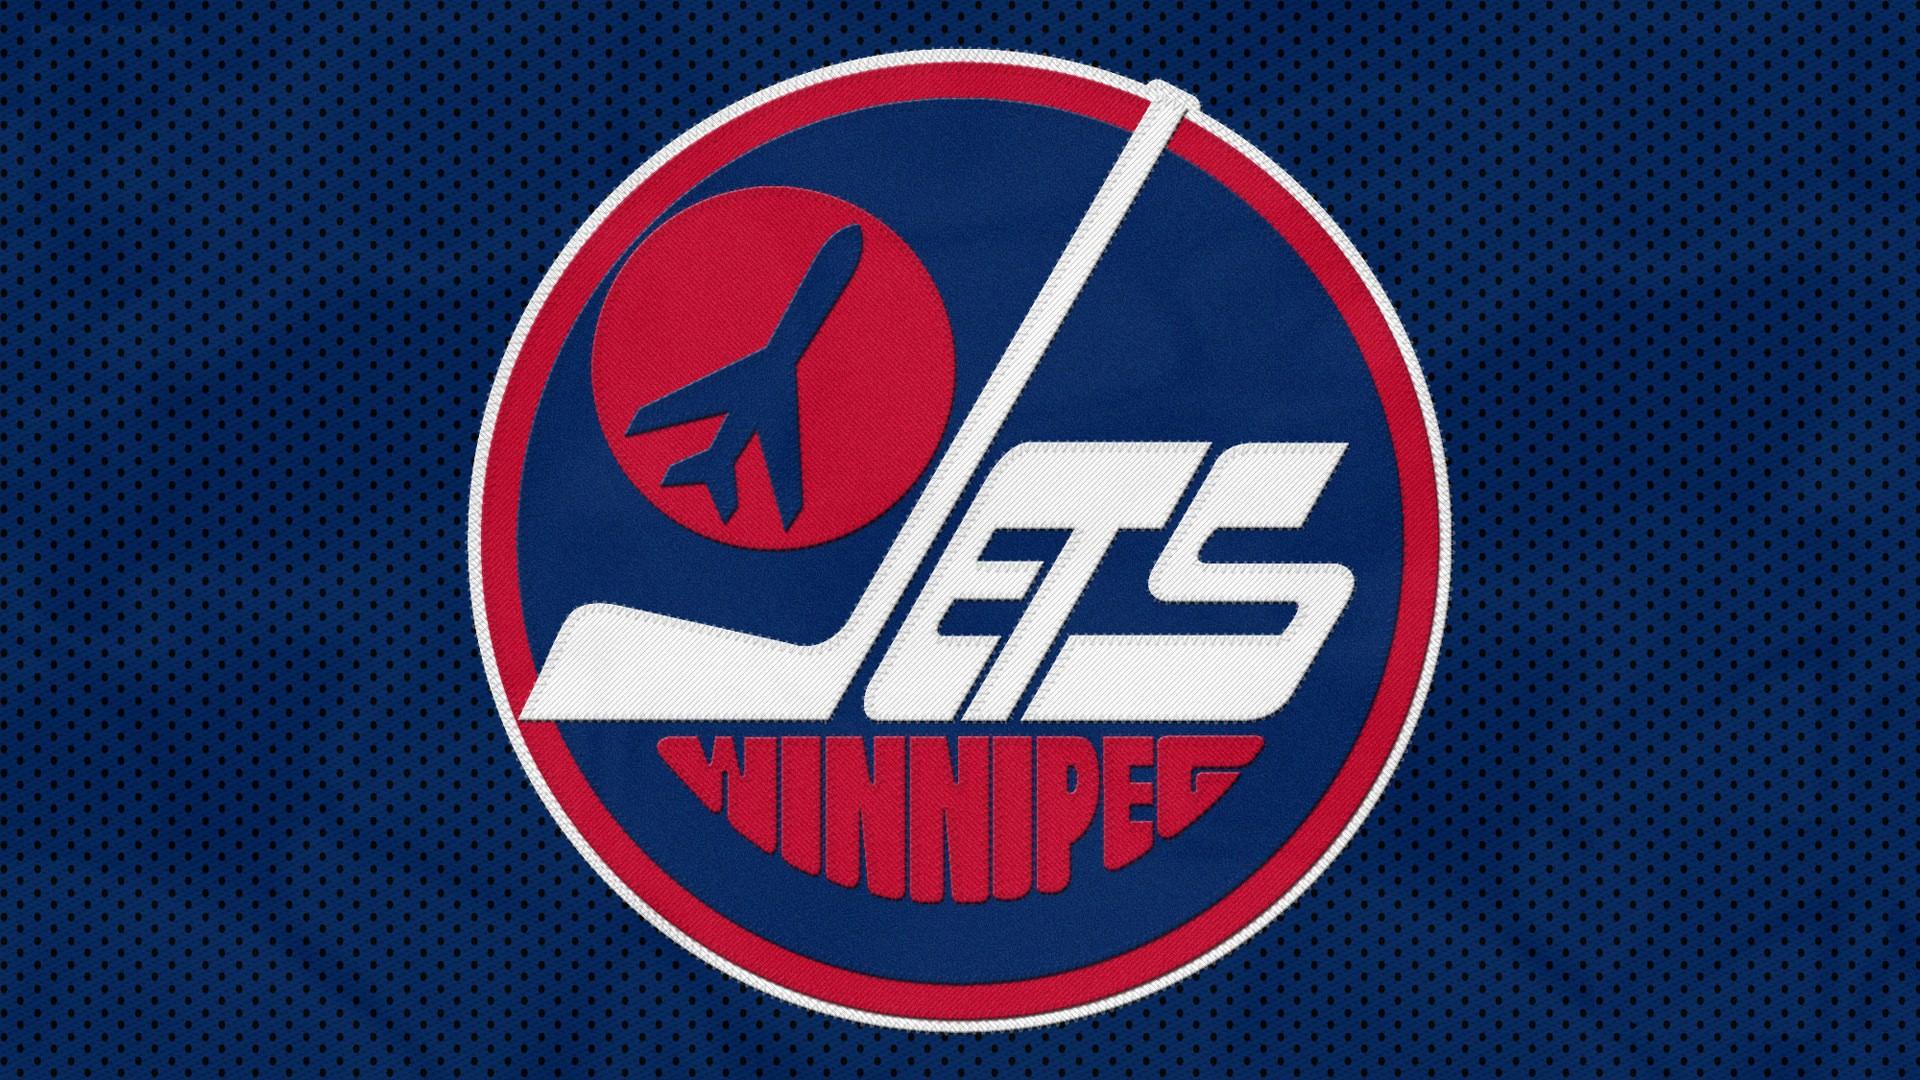 7 winnipeg jets hd wallpapers backgrounds wallpaper abyss - Winnipeg jets wallpaper ...